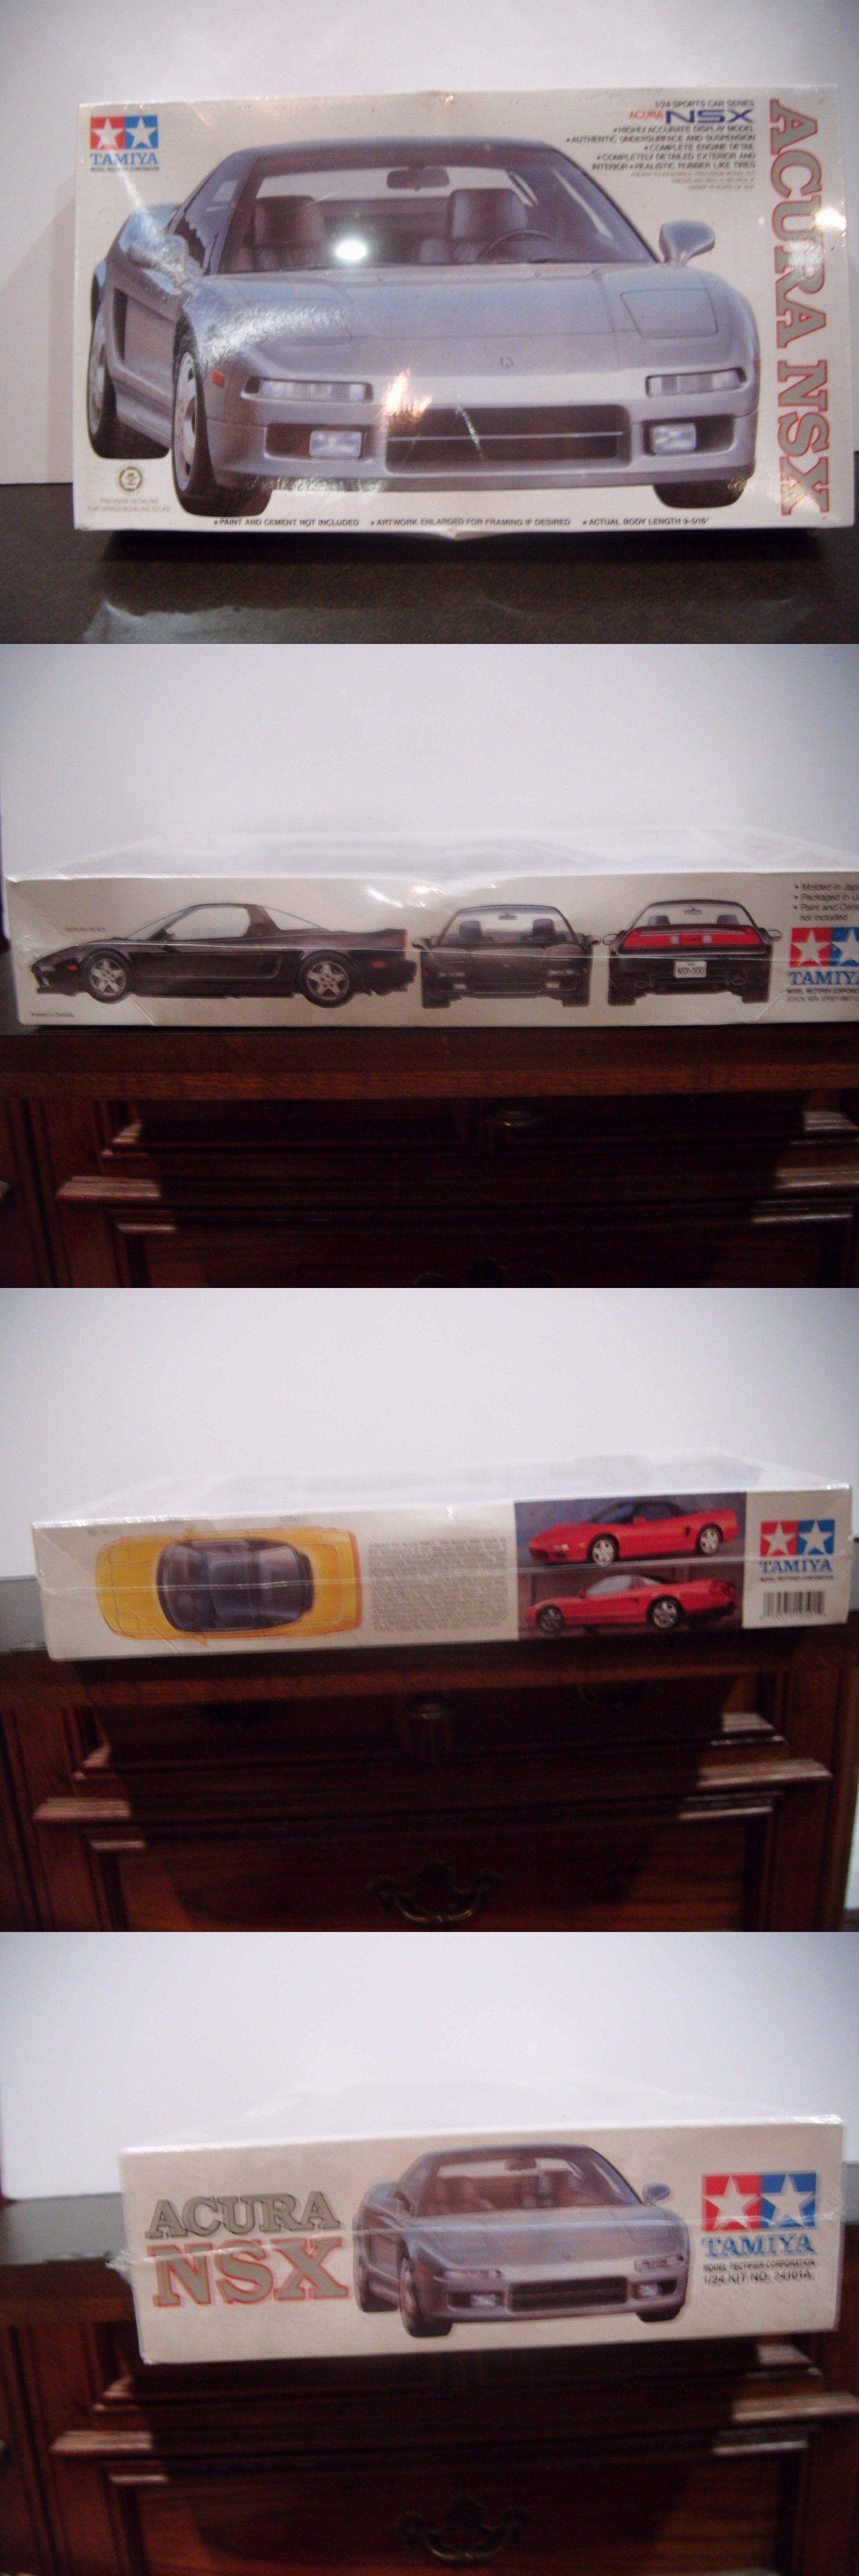 d5f17fe5463a461939a46588b380aa42 Breathtaking Tamiya Porsche 911 Gt1 Full View Cars Trend